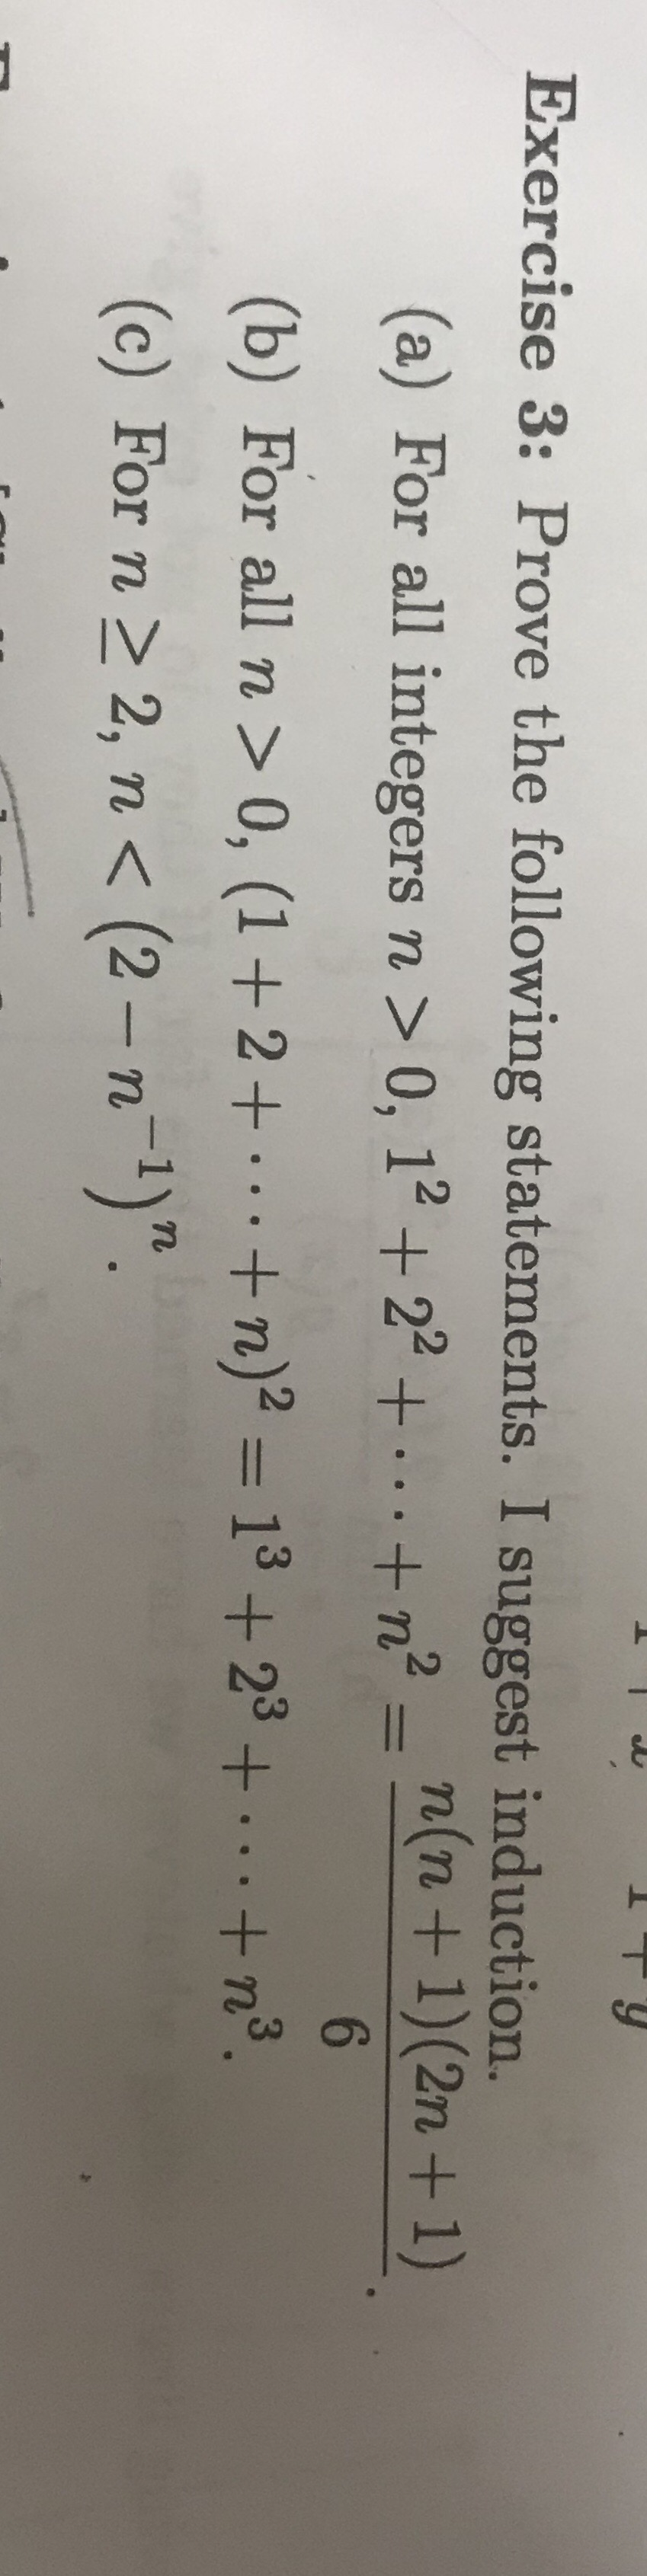 "Exercise 3: Prove the following statements. I suggest induction. (a) For all integers n > 0, 12 + 22 +...+n-n(n+1) (2n + 1) 6 (b) For all n > 0, (1+2+.+ n)2 = 13 + 23 + .+n3. (c) For n 2, n < (2 -n1)""."